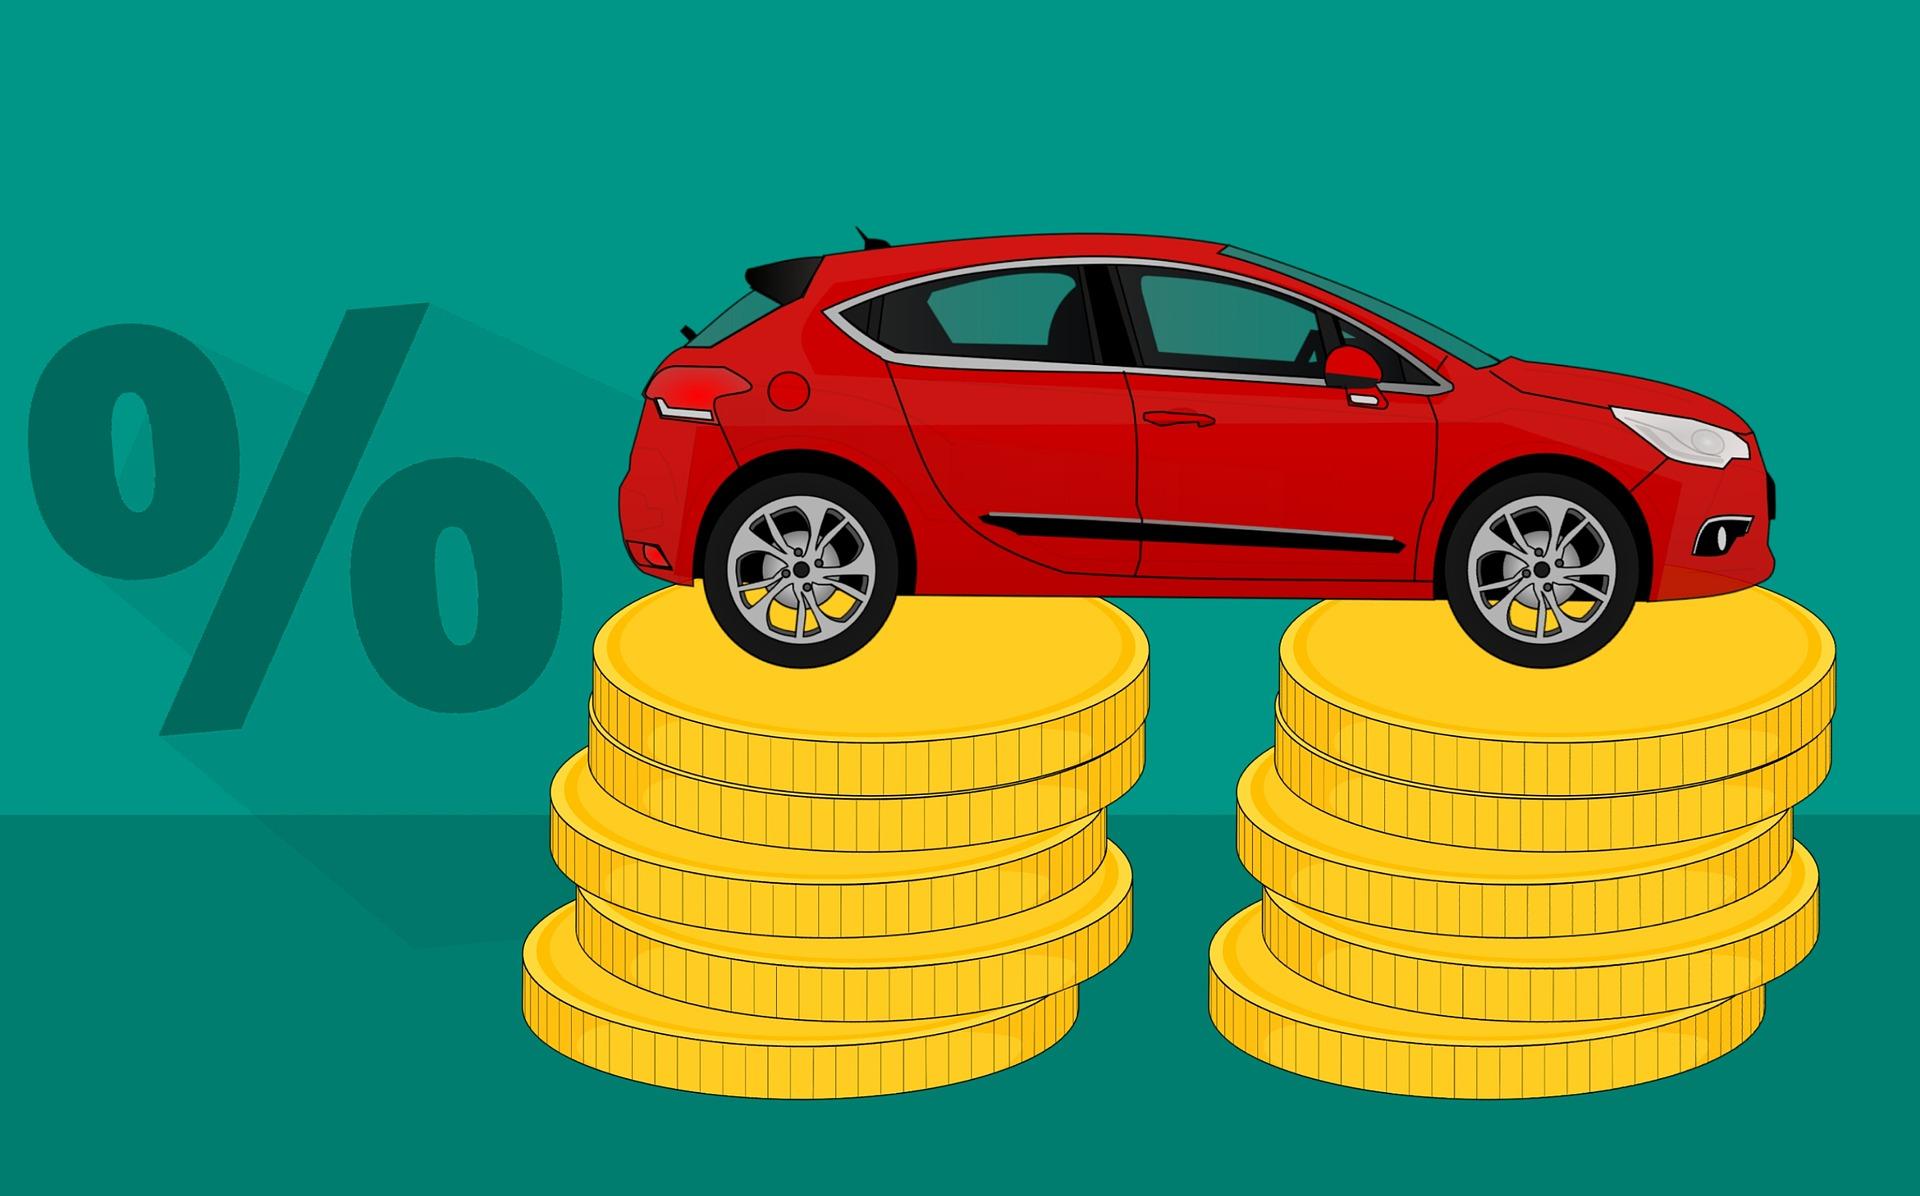 http://bankstatementsmodify.com/